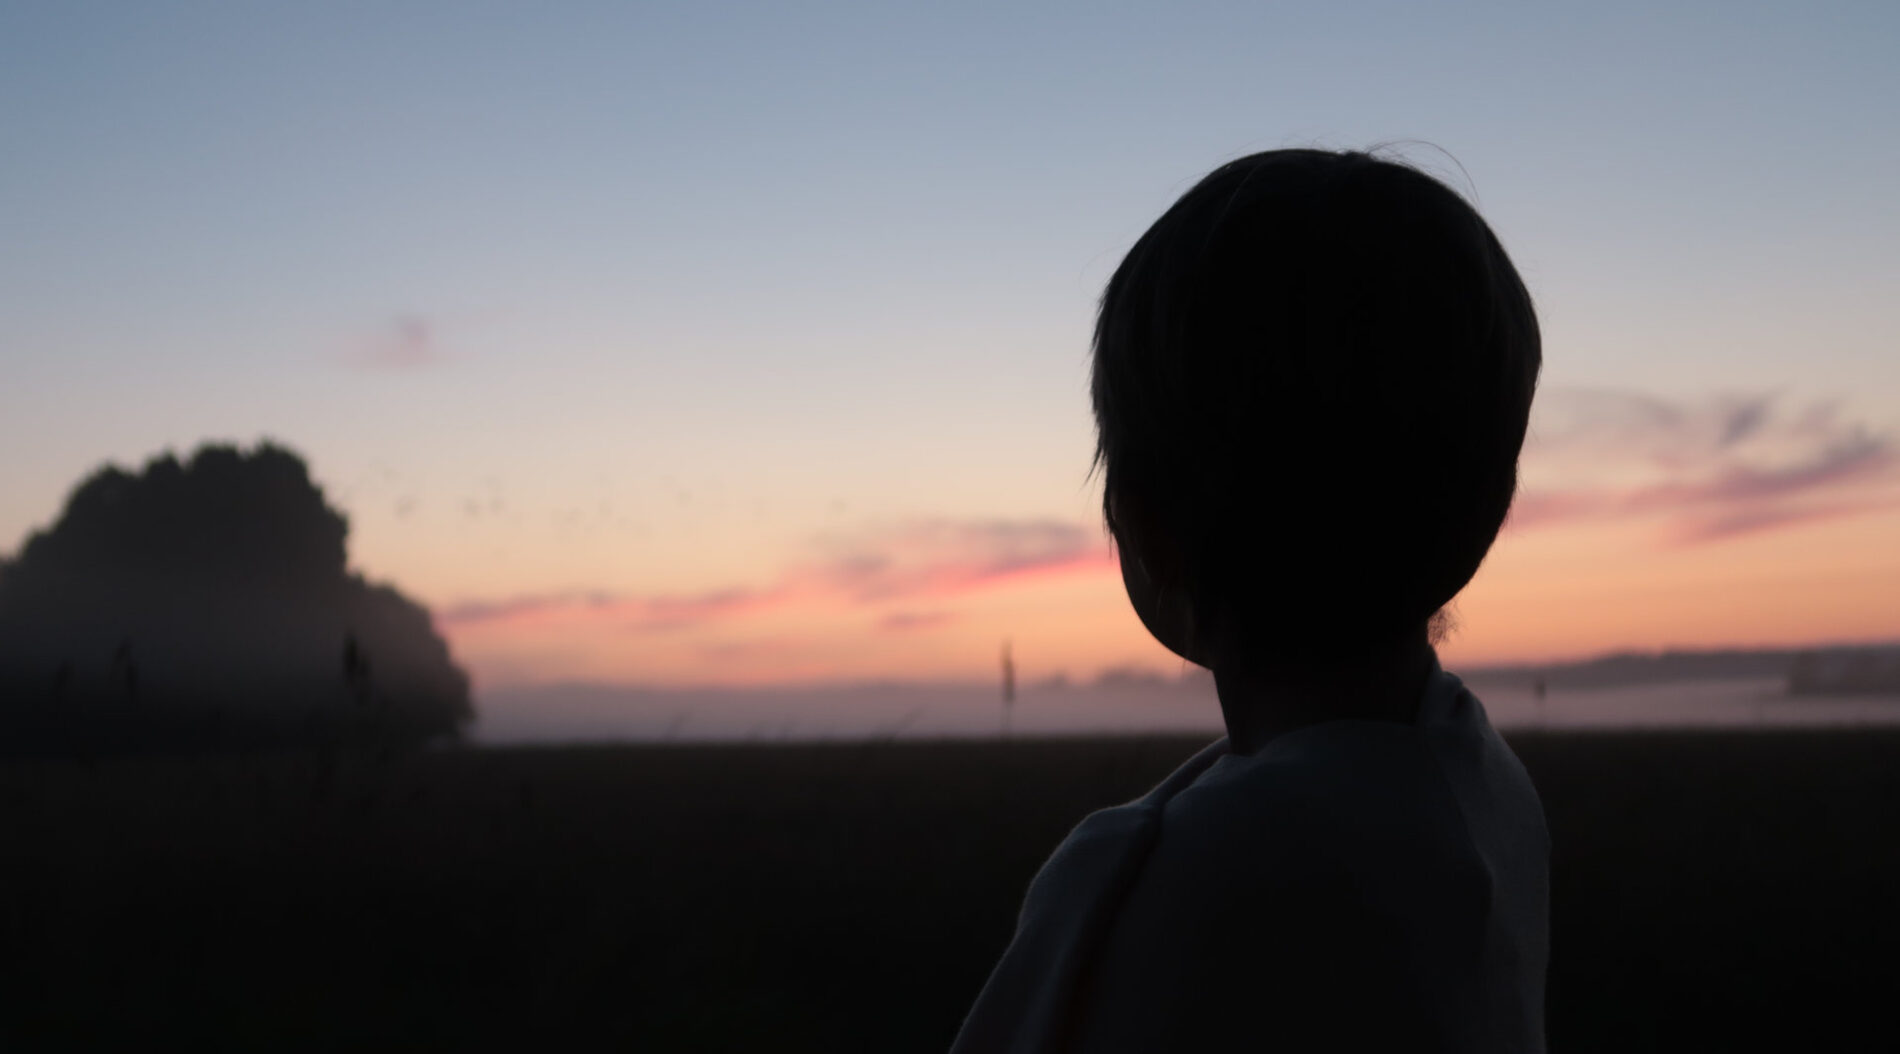 Tjörn sunset. Photo: Sanjin Đumišić.